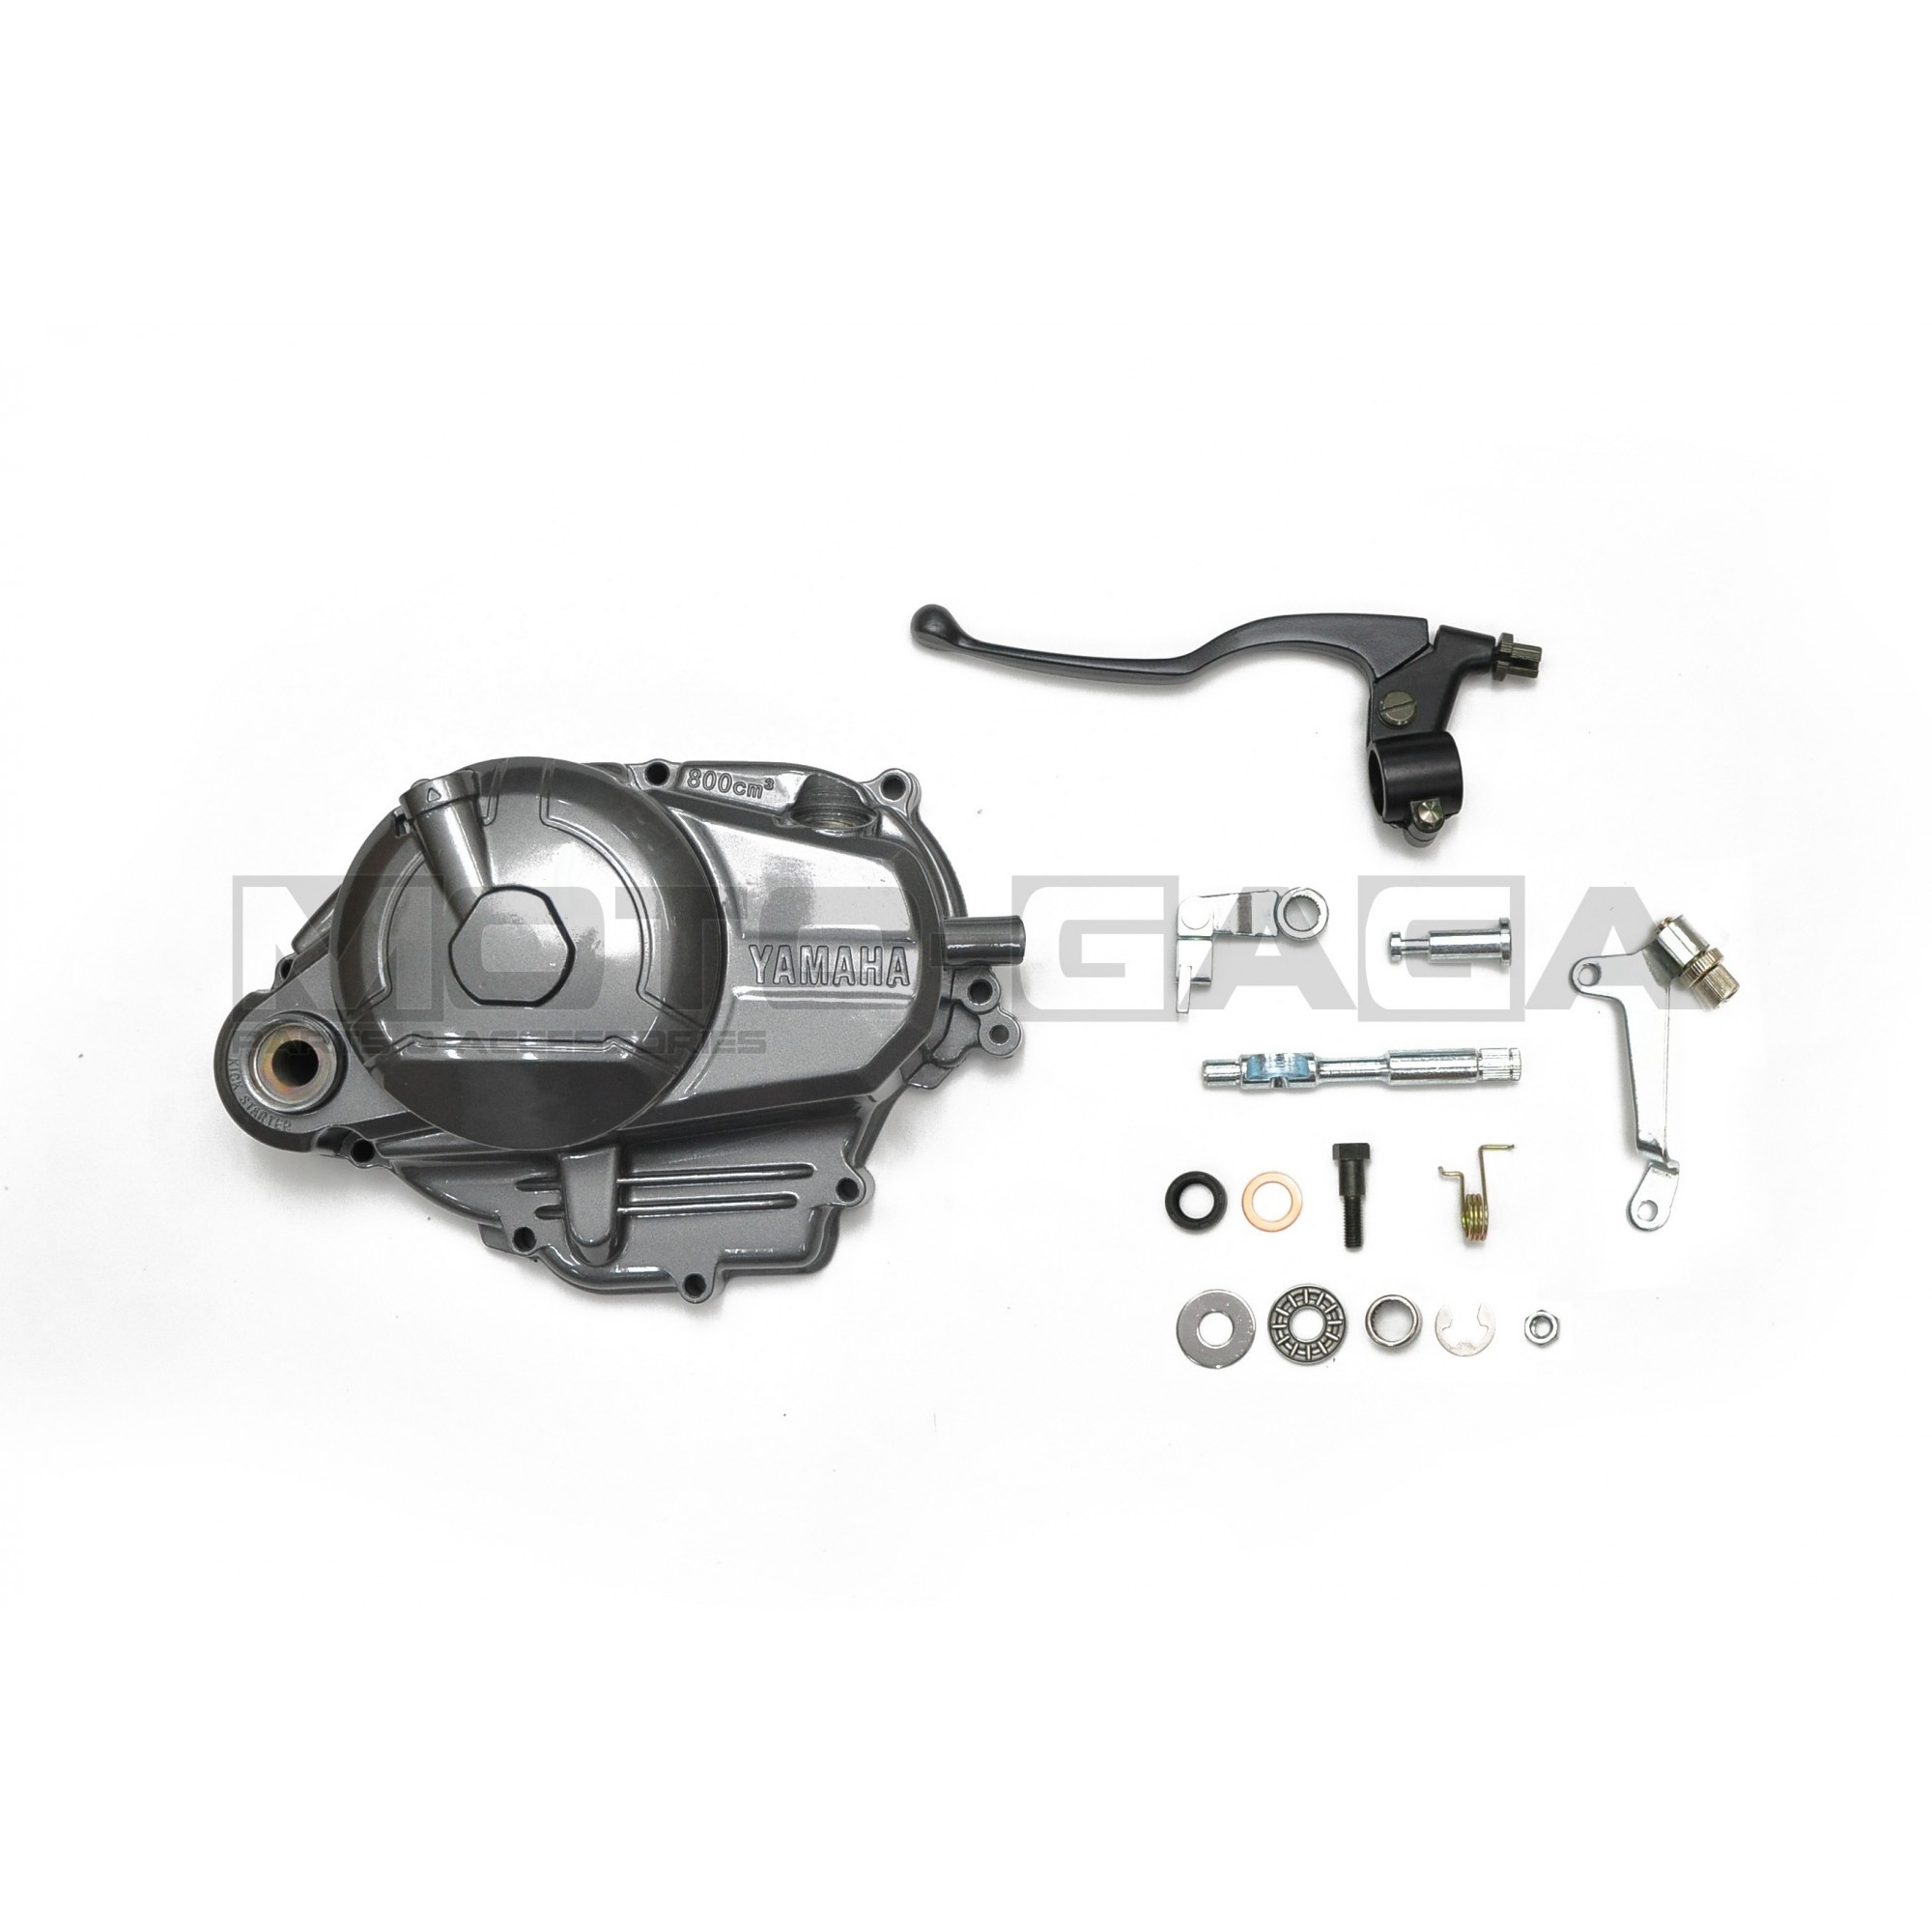 Yamaha 125z Engine Diagram Yamaha Crypton Jupiter Vega T 110 Manual Hand Clutch Conversion Kit Of Yamaha 125z Engine Diagram